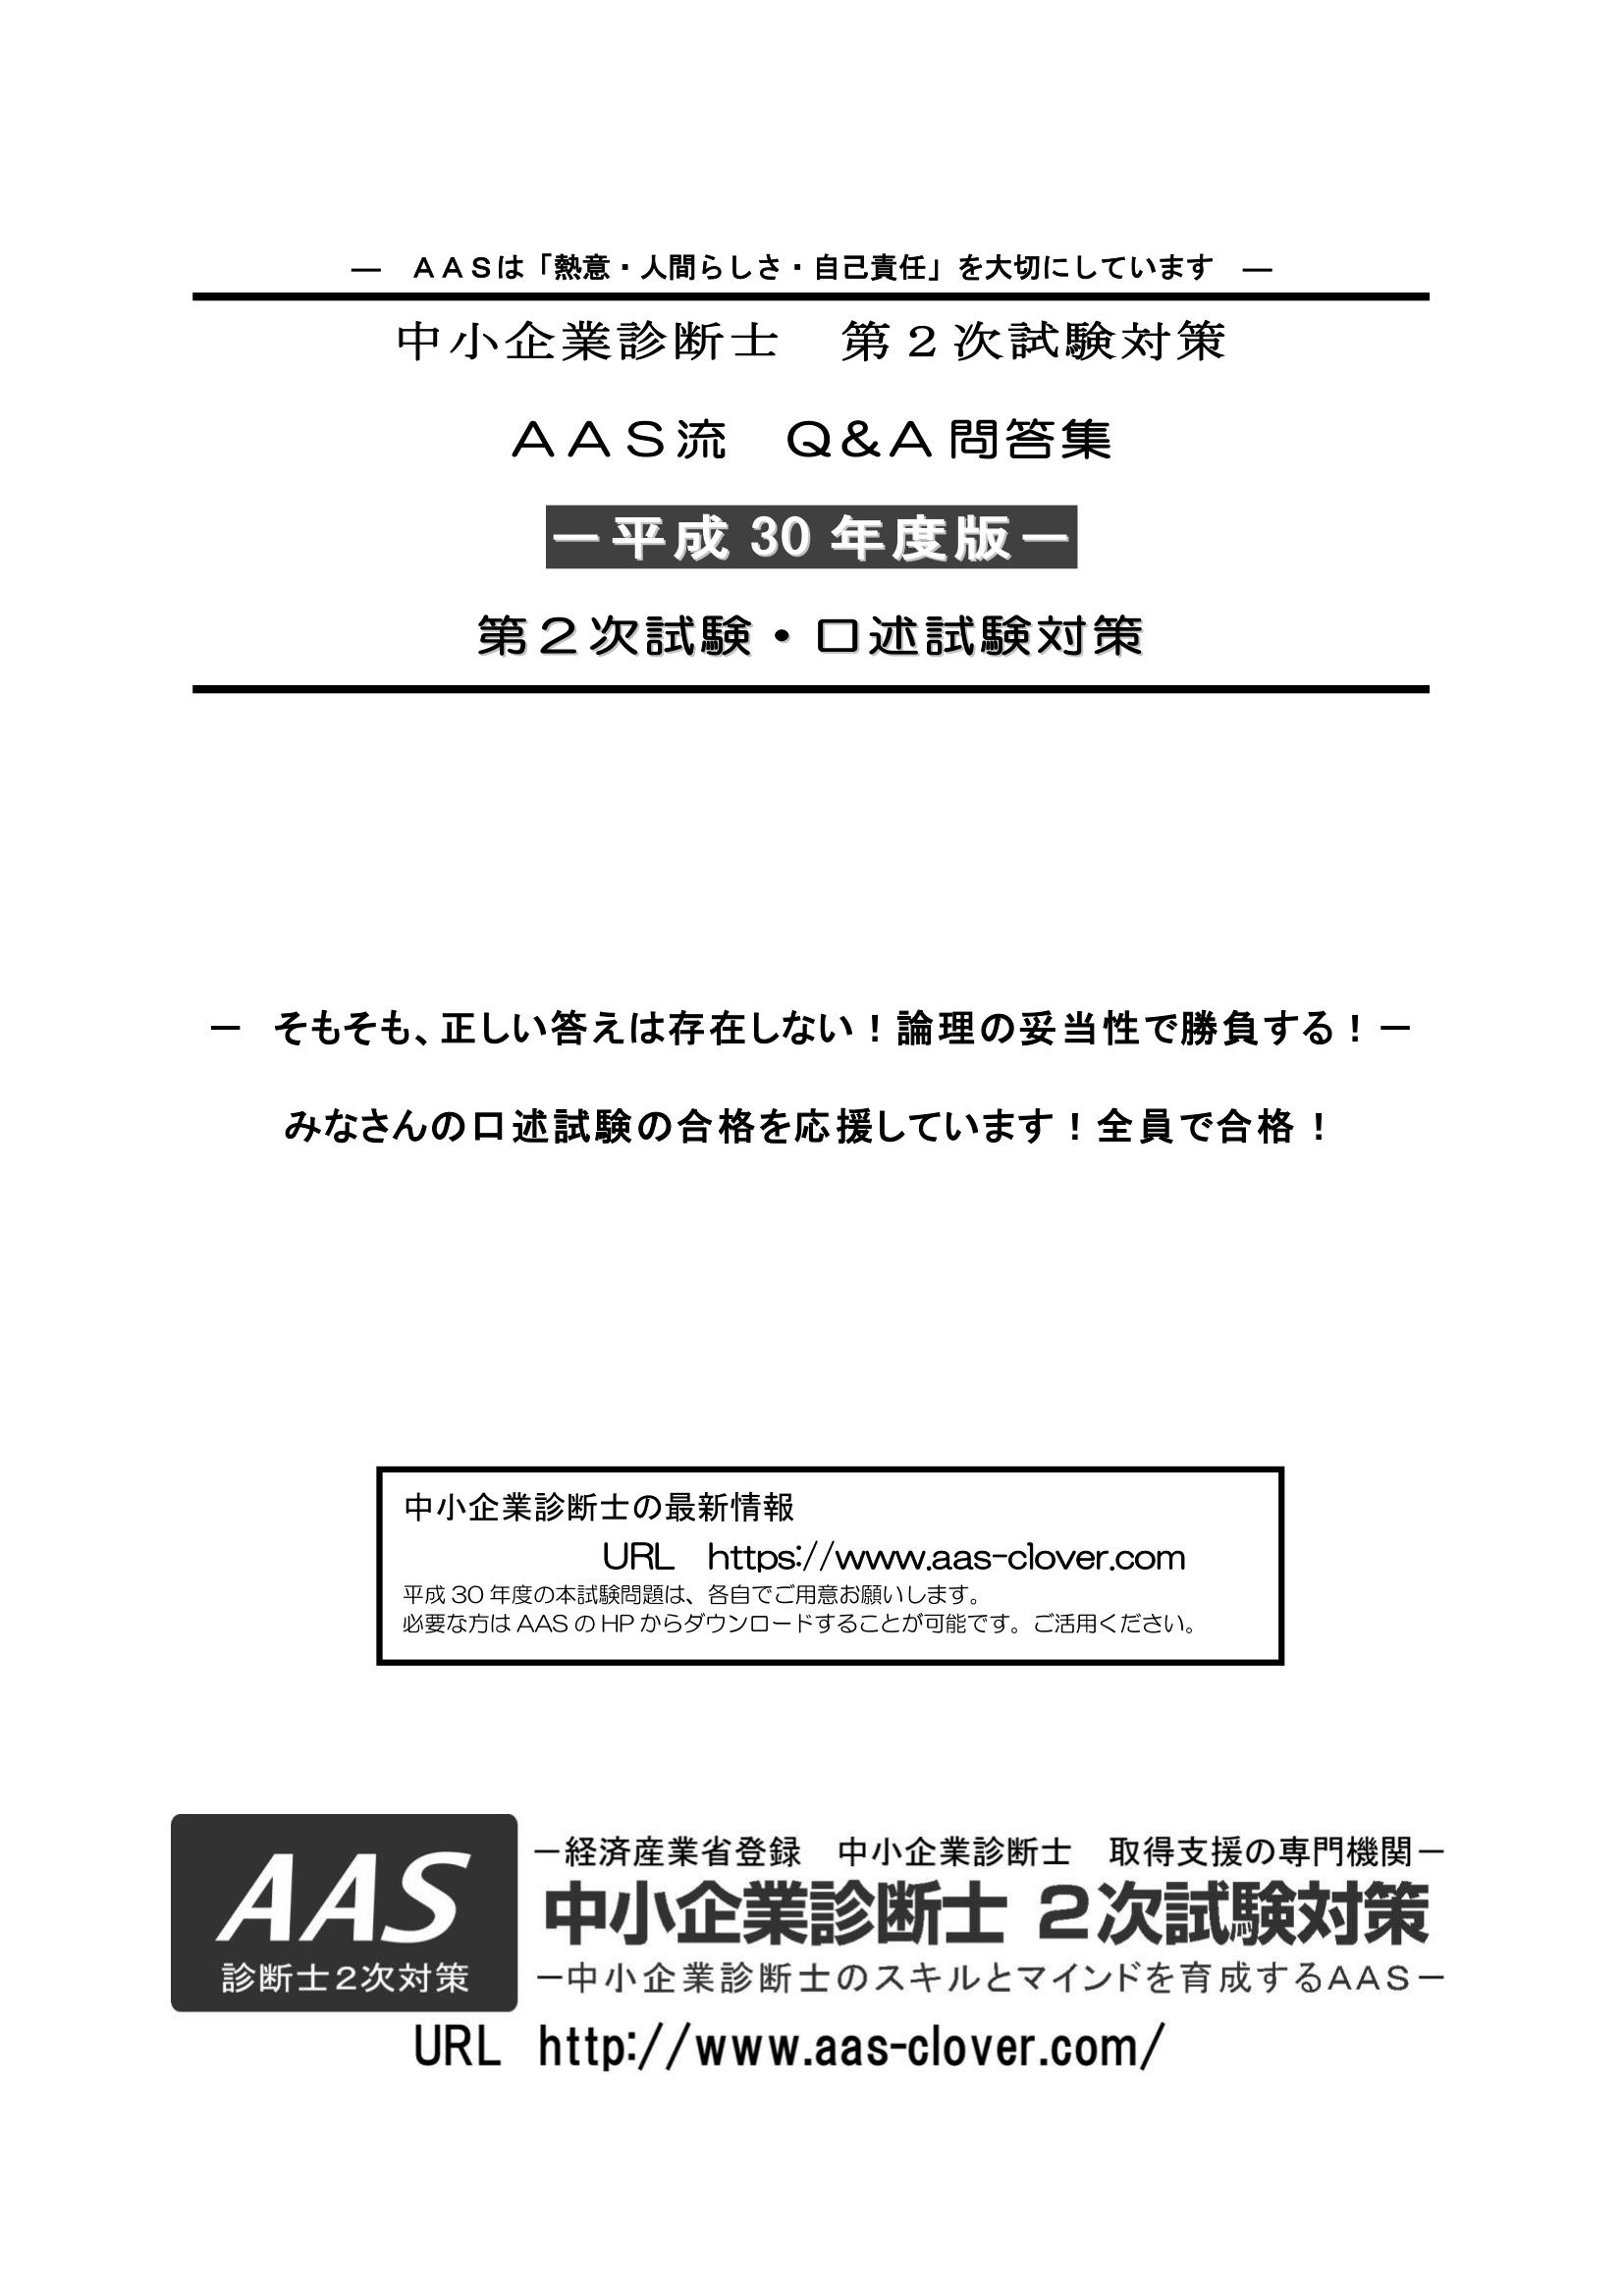 Q&A問答集(平成30年度版)